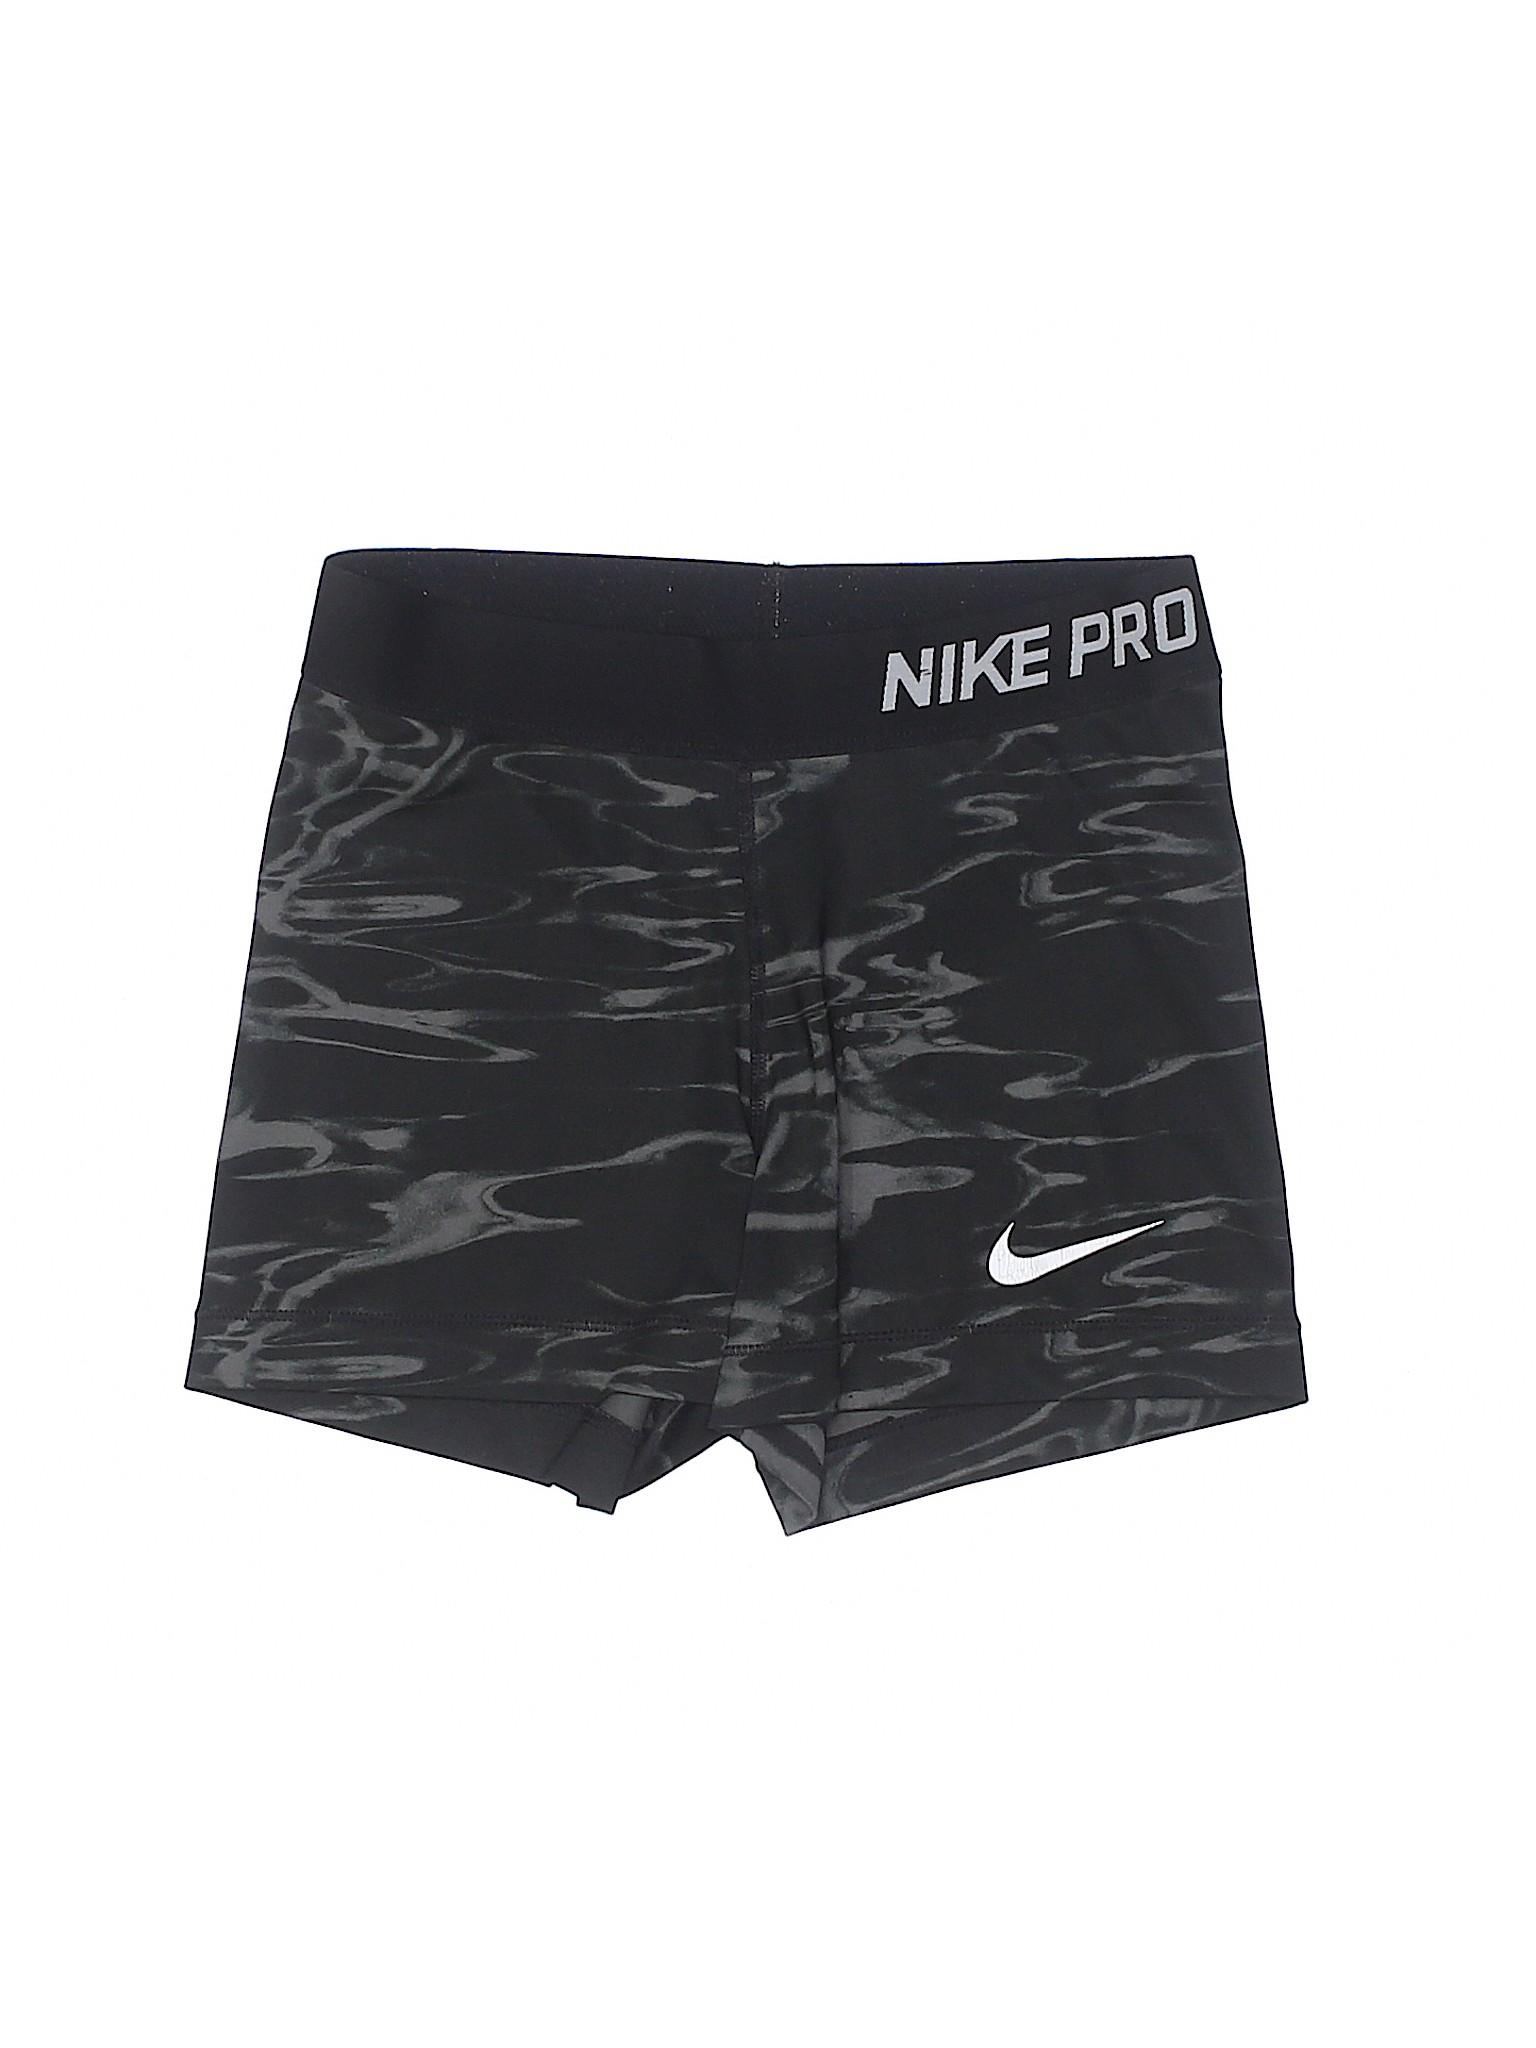 Nike Shorts winter Leisure Athletic winter Leisure winter Athletic Shorts Athletic Nike Shorts Leisure Nike O5aqxwx